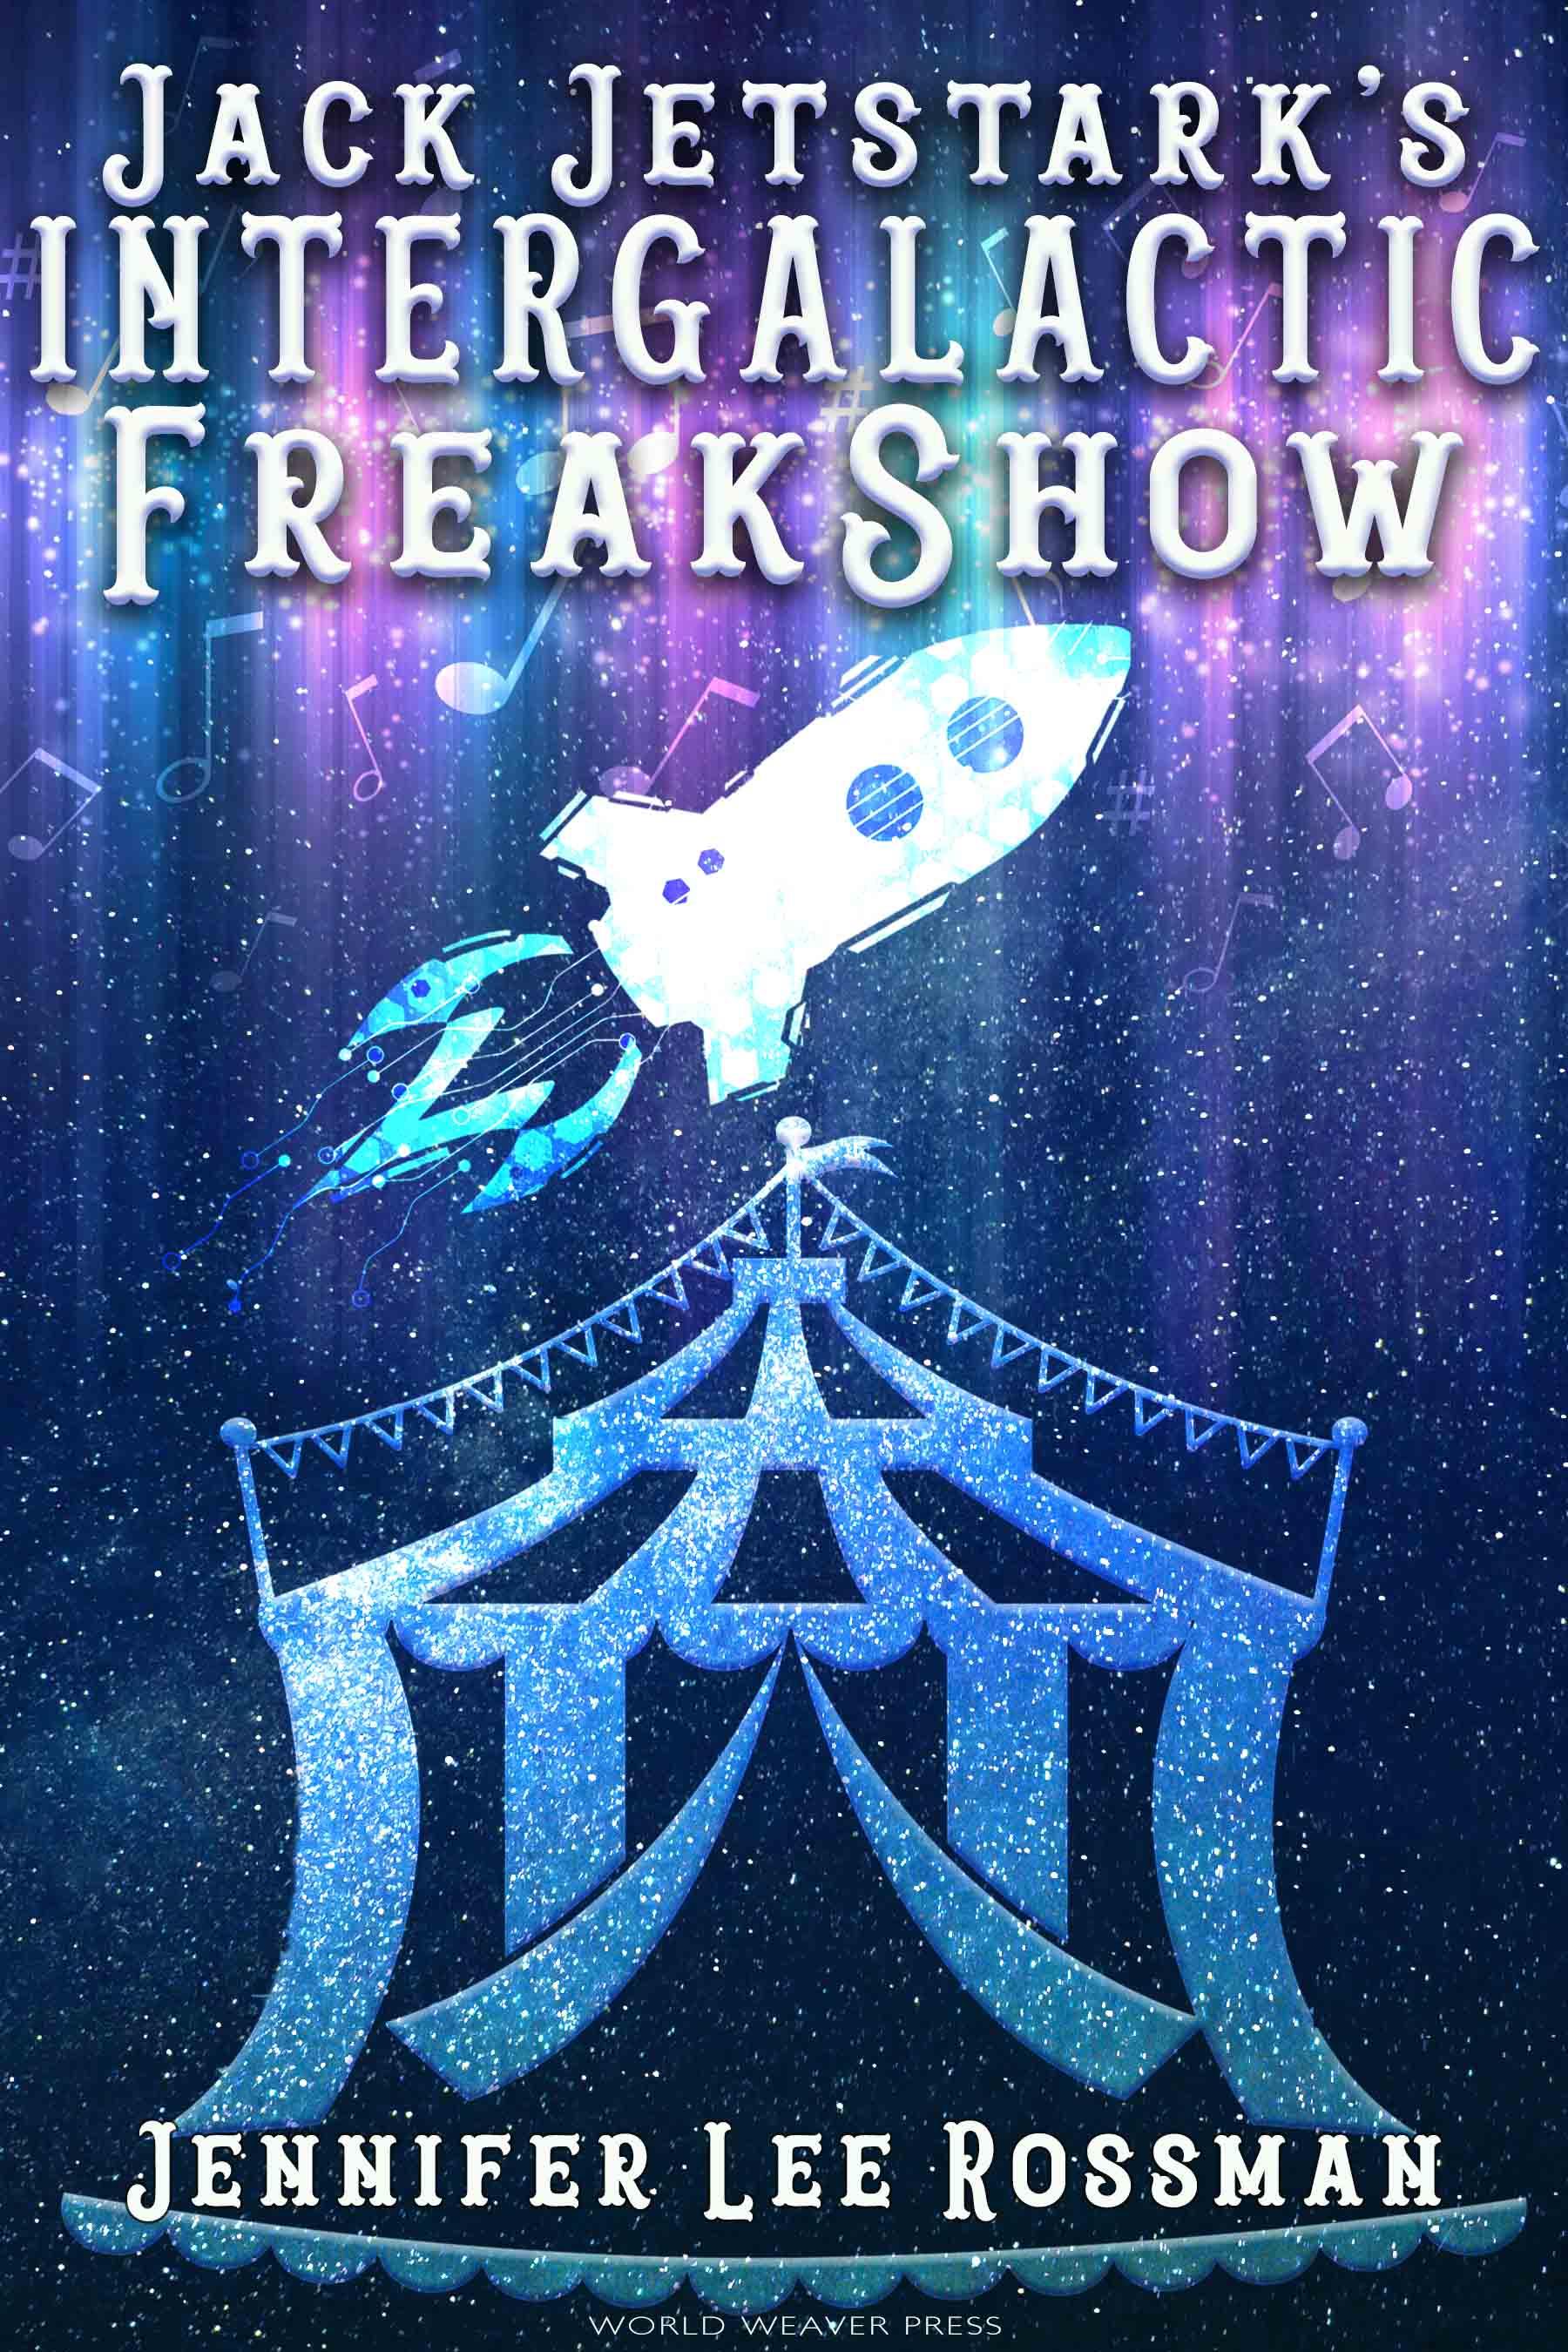 Cover image for Jack Jetstark's Intergalactic Freak Show